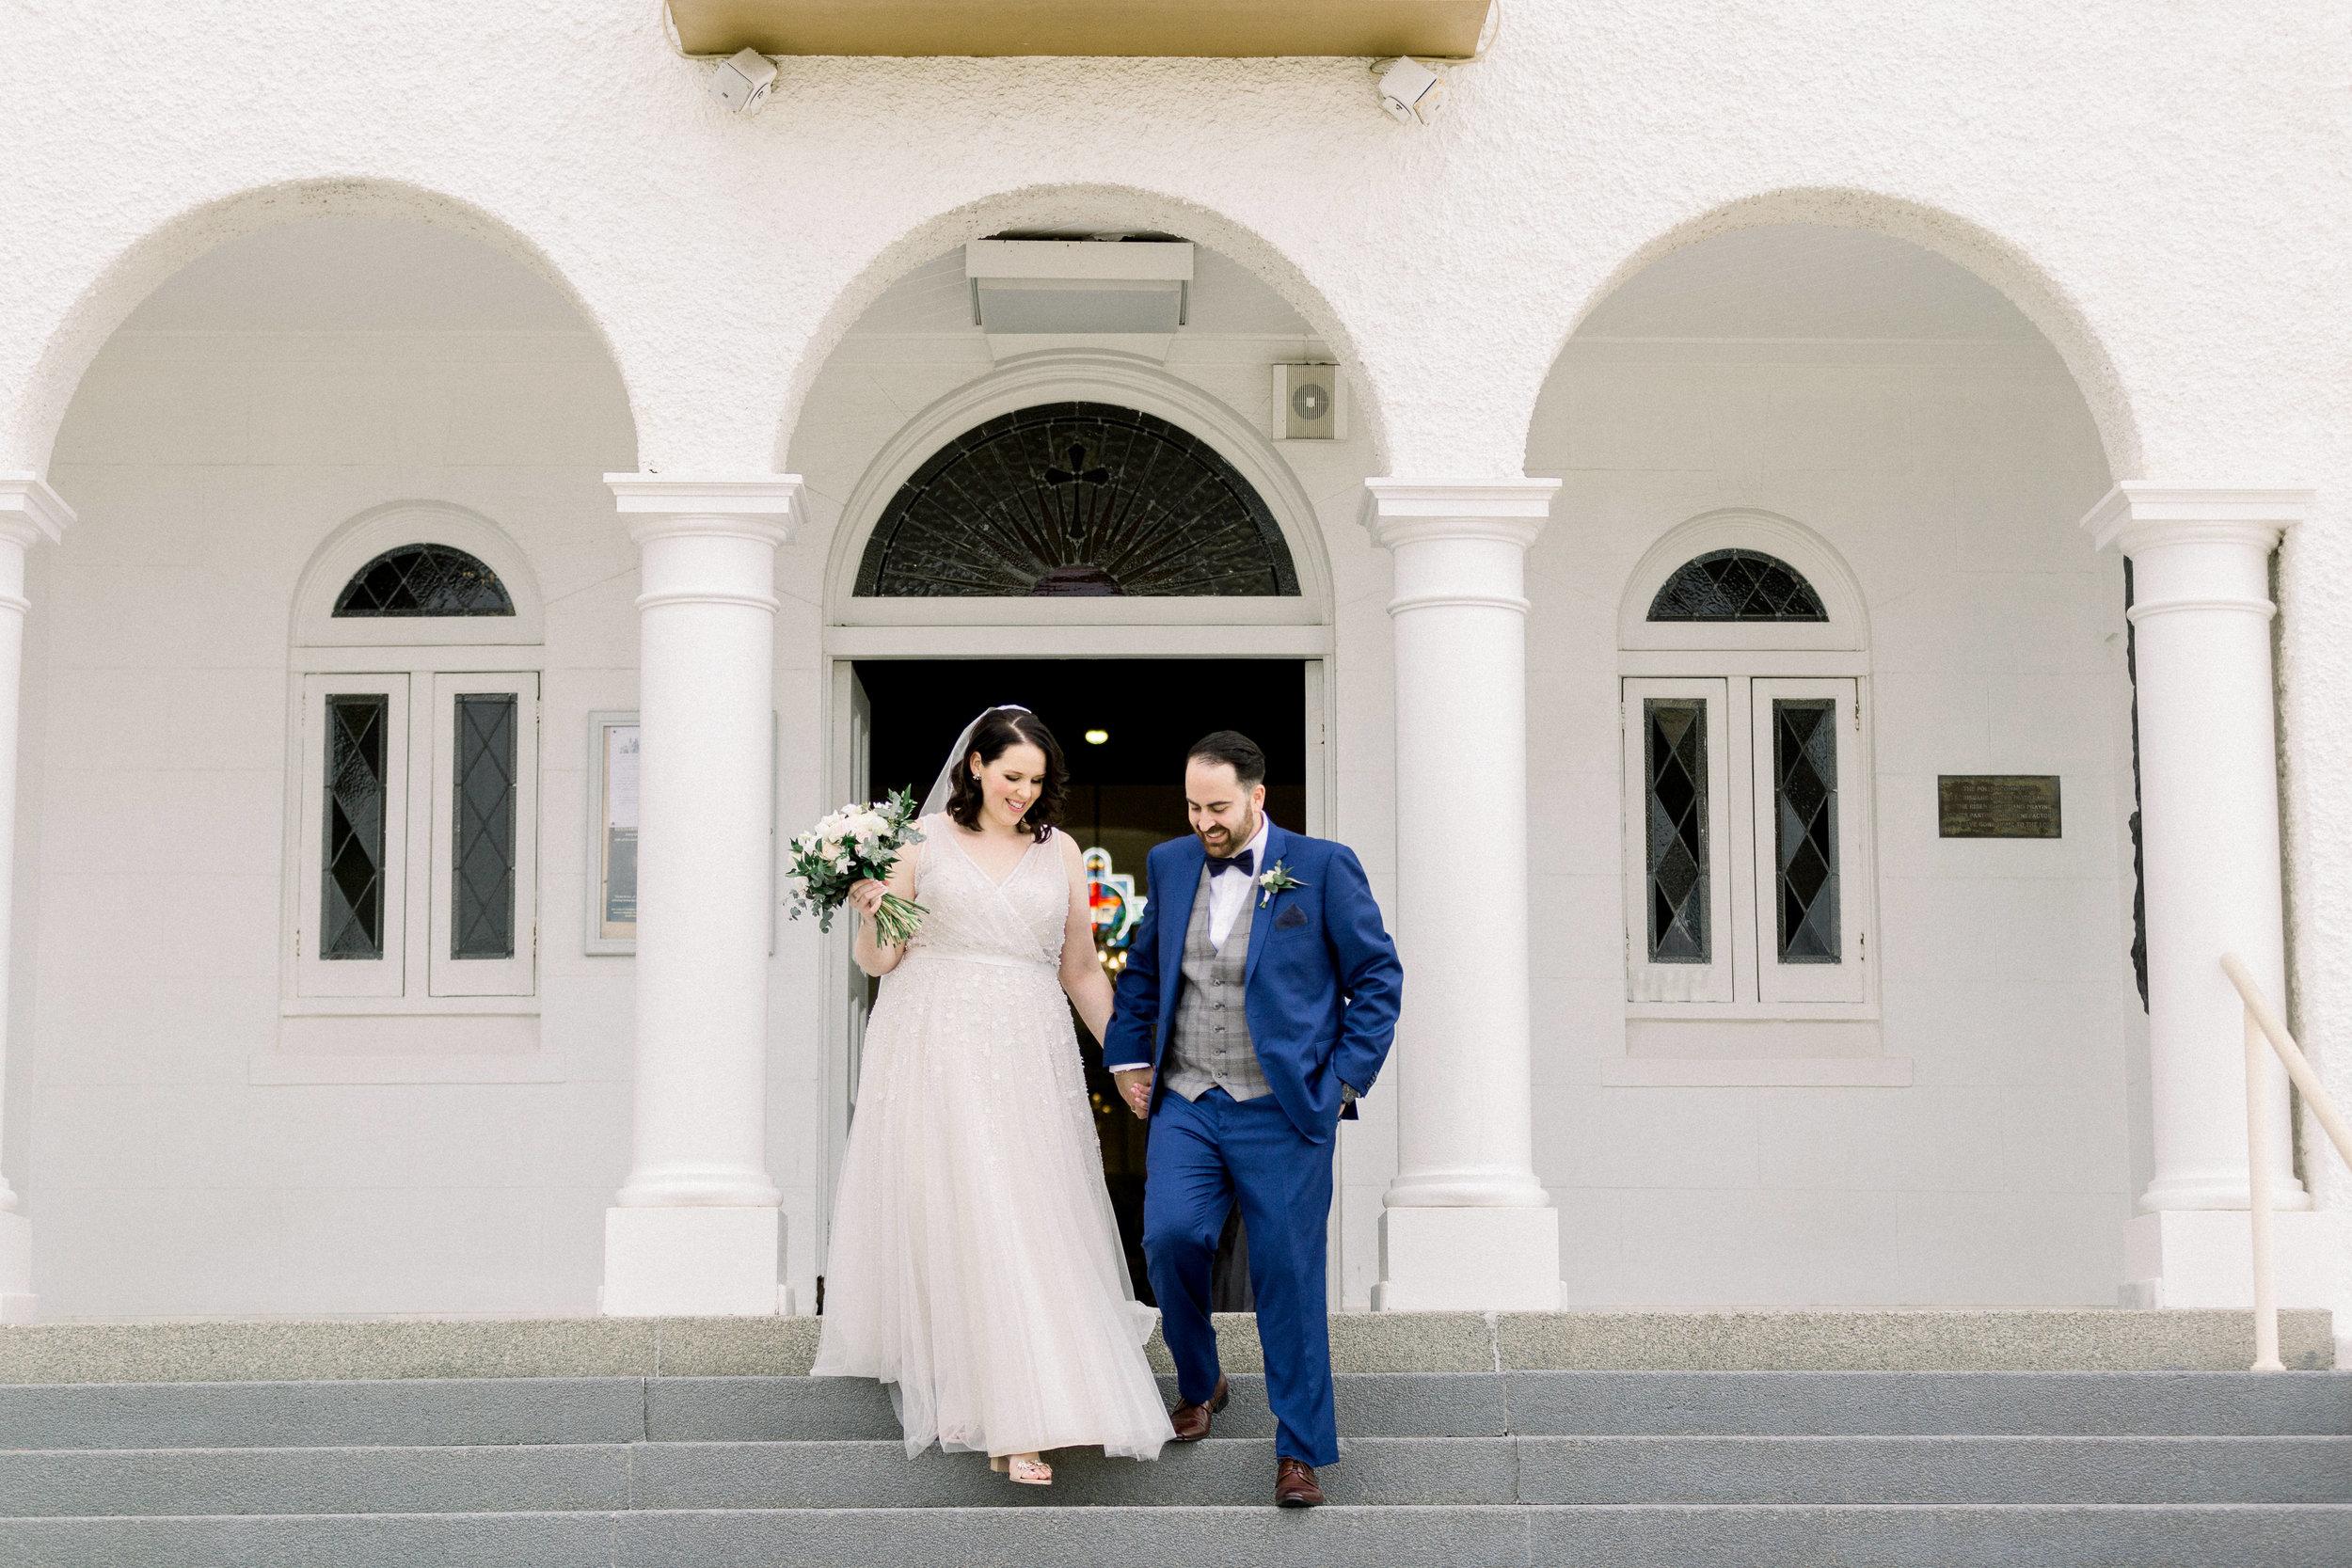 brisbane-city-wedding-photographer-romantic-wedding-59.jpg